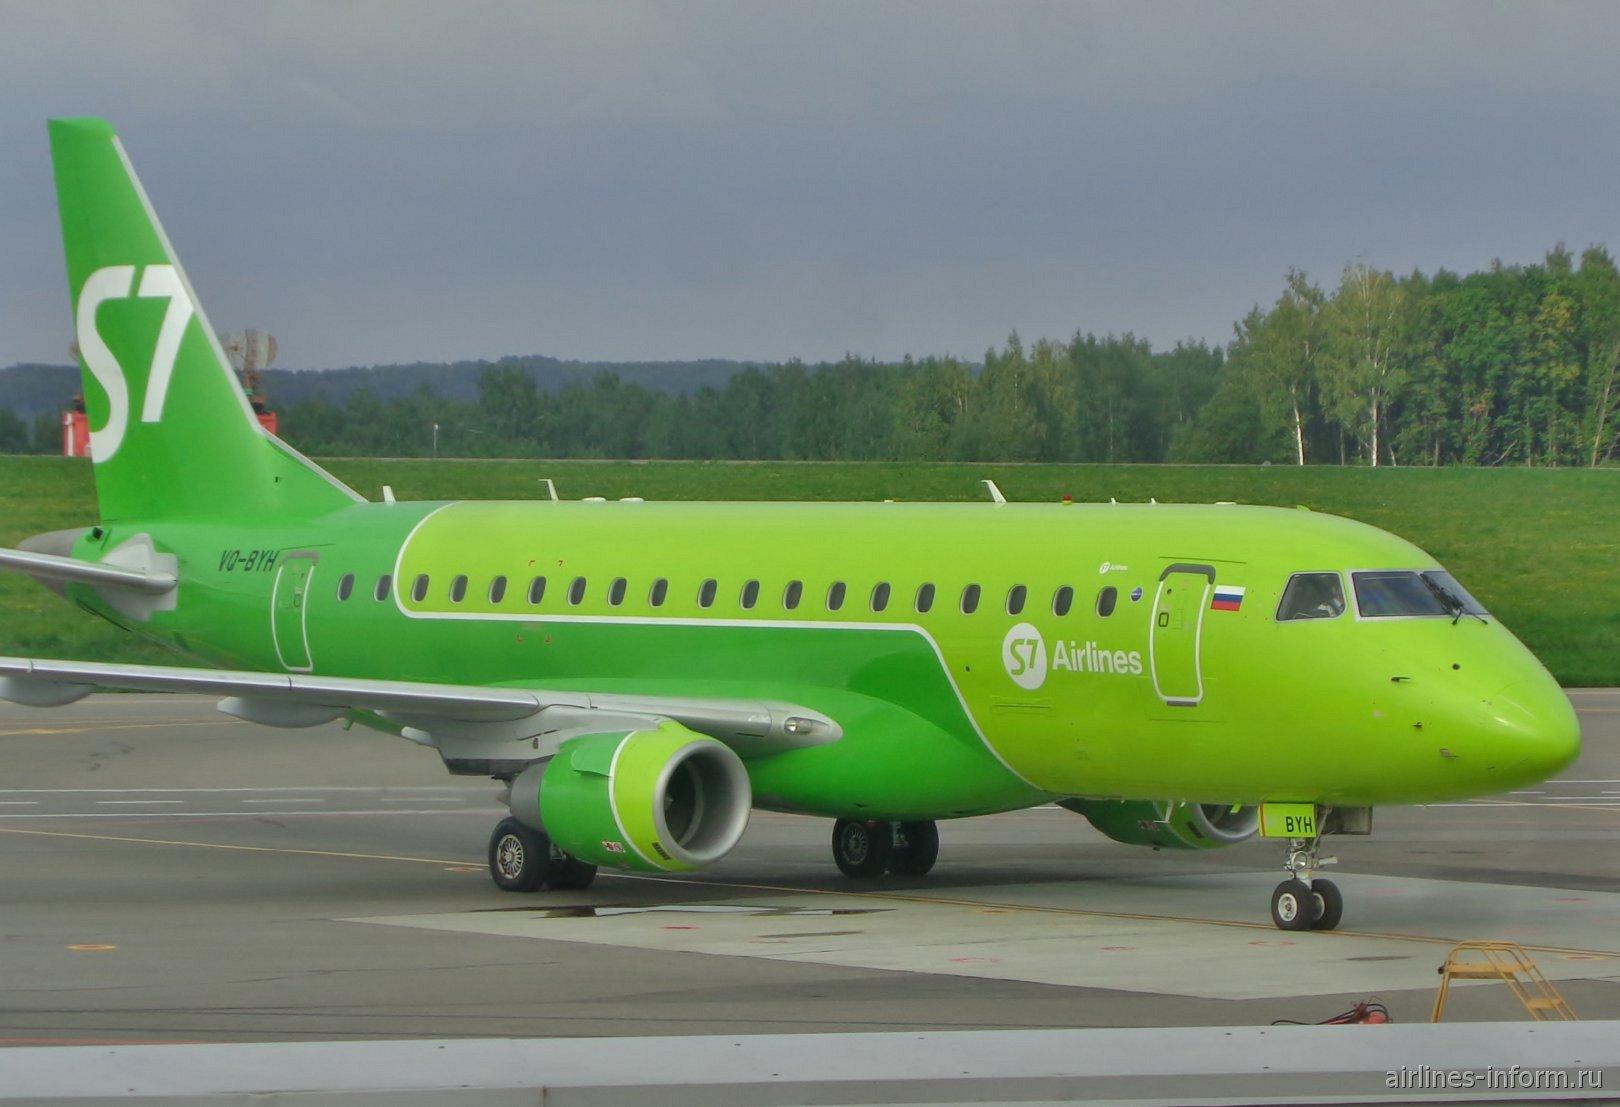 Самолет Embraer 170 VQ-BYH авиакомпании S7 Airlines в аэропорту Калуга Грабцево